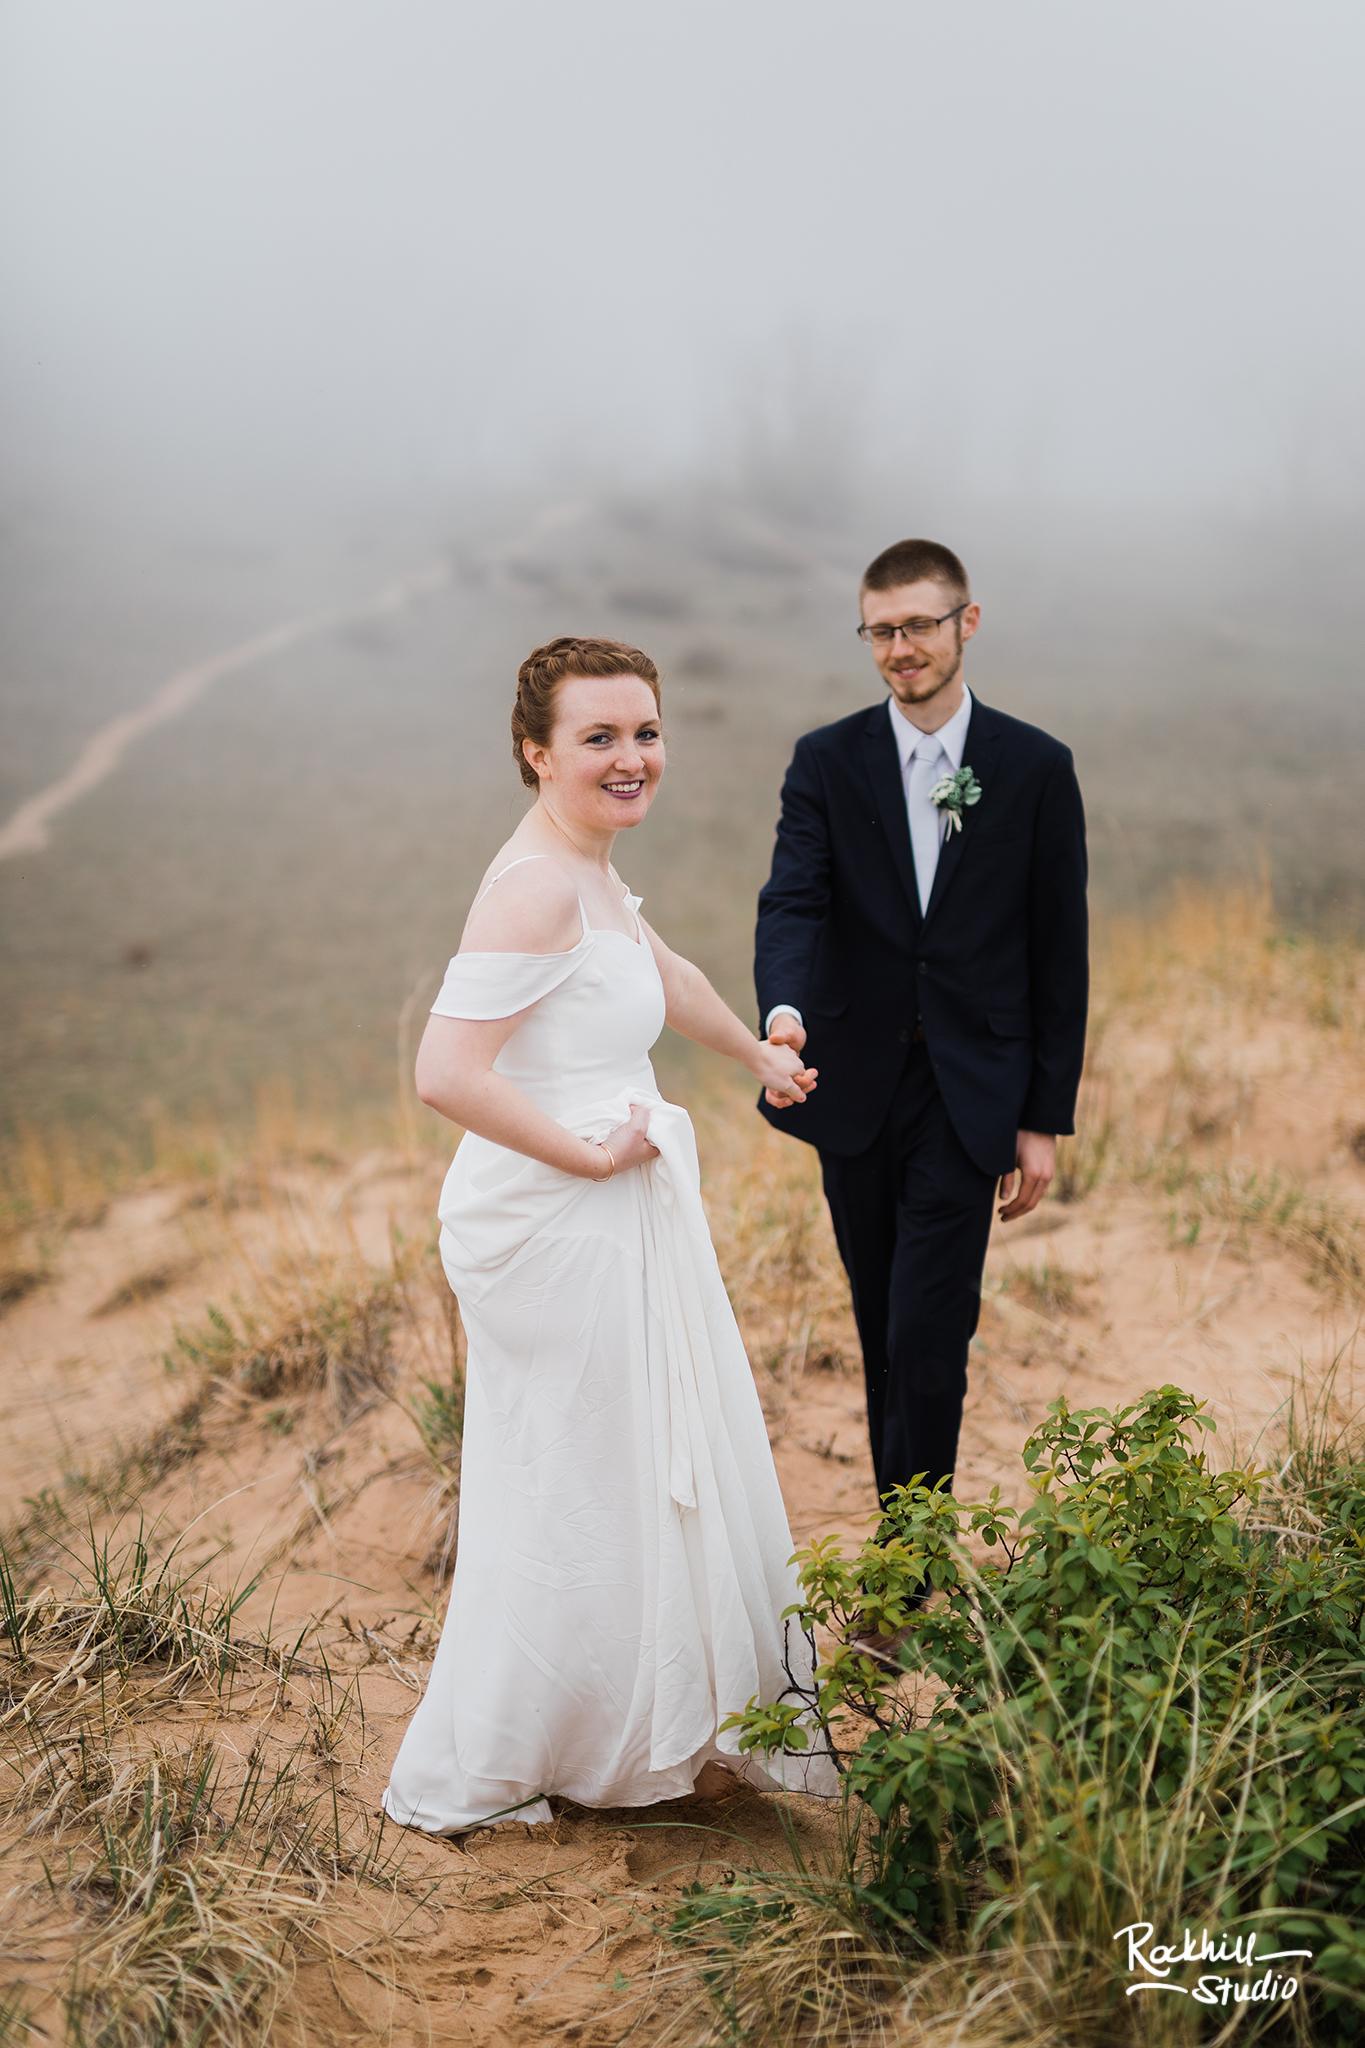 traverse_city_wedding_photographer_sleeping_bear_dunes_rockhill_fog_1a.jpg